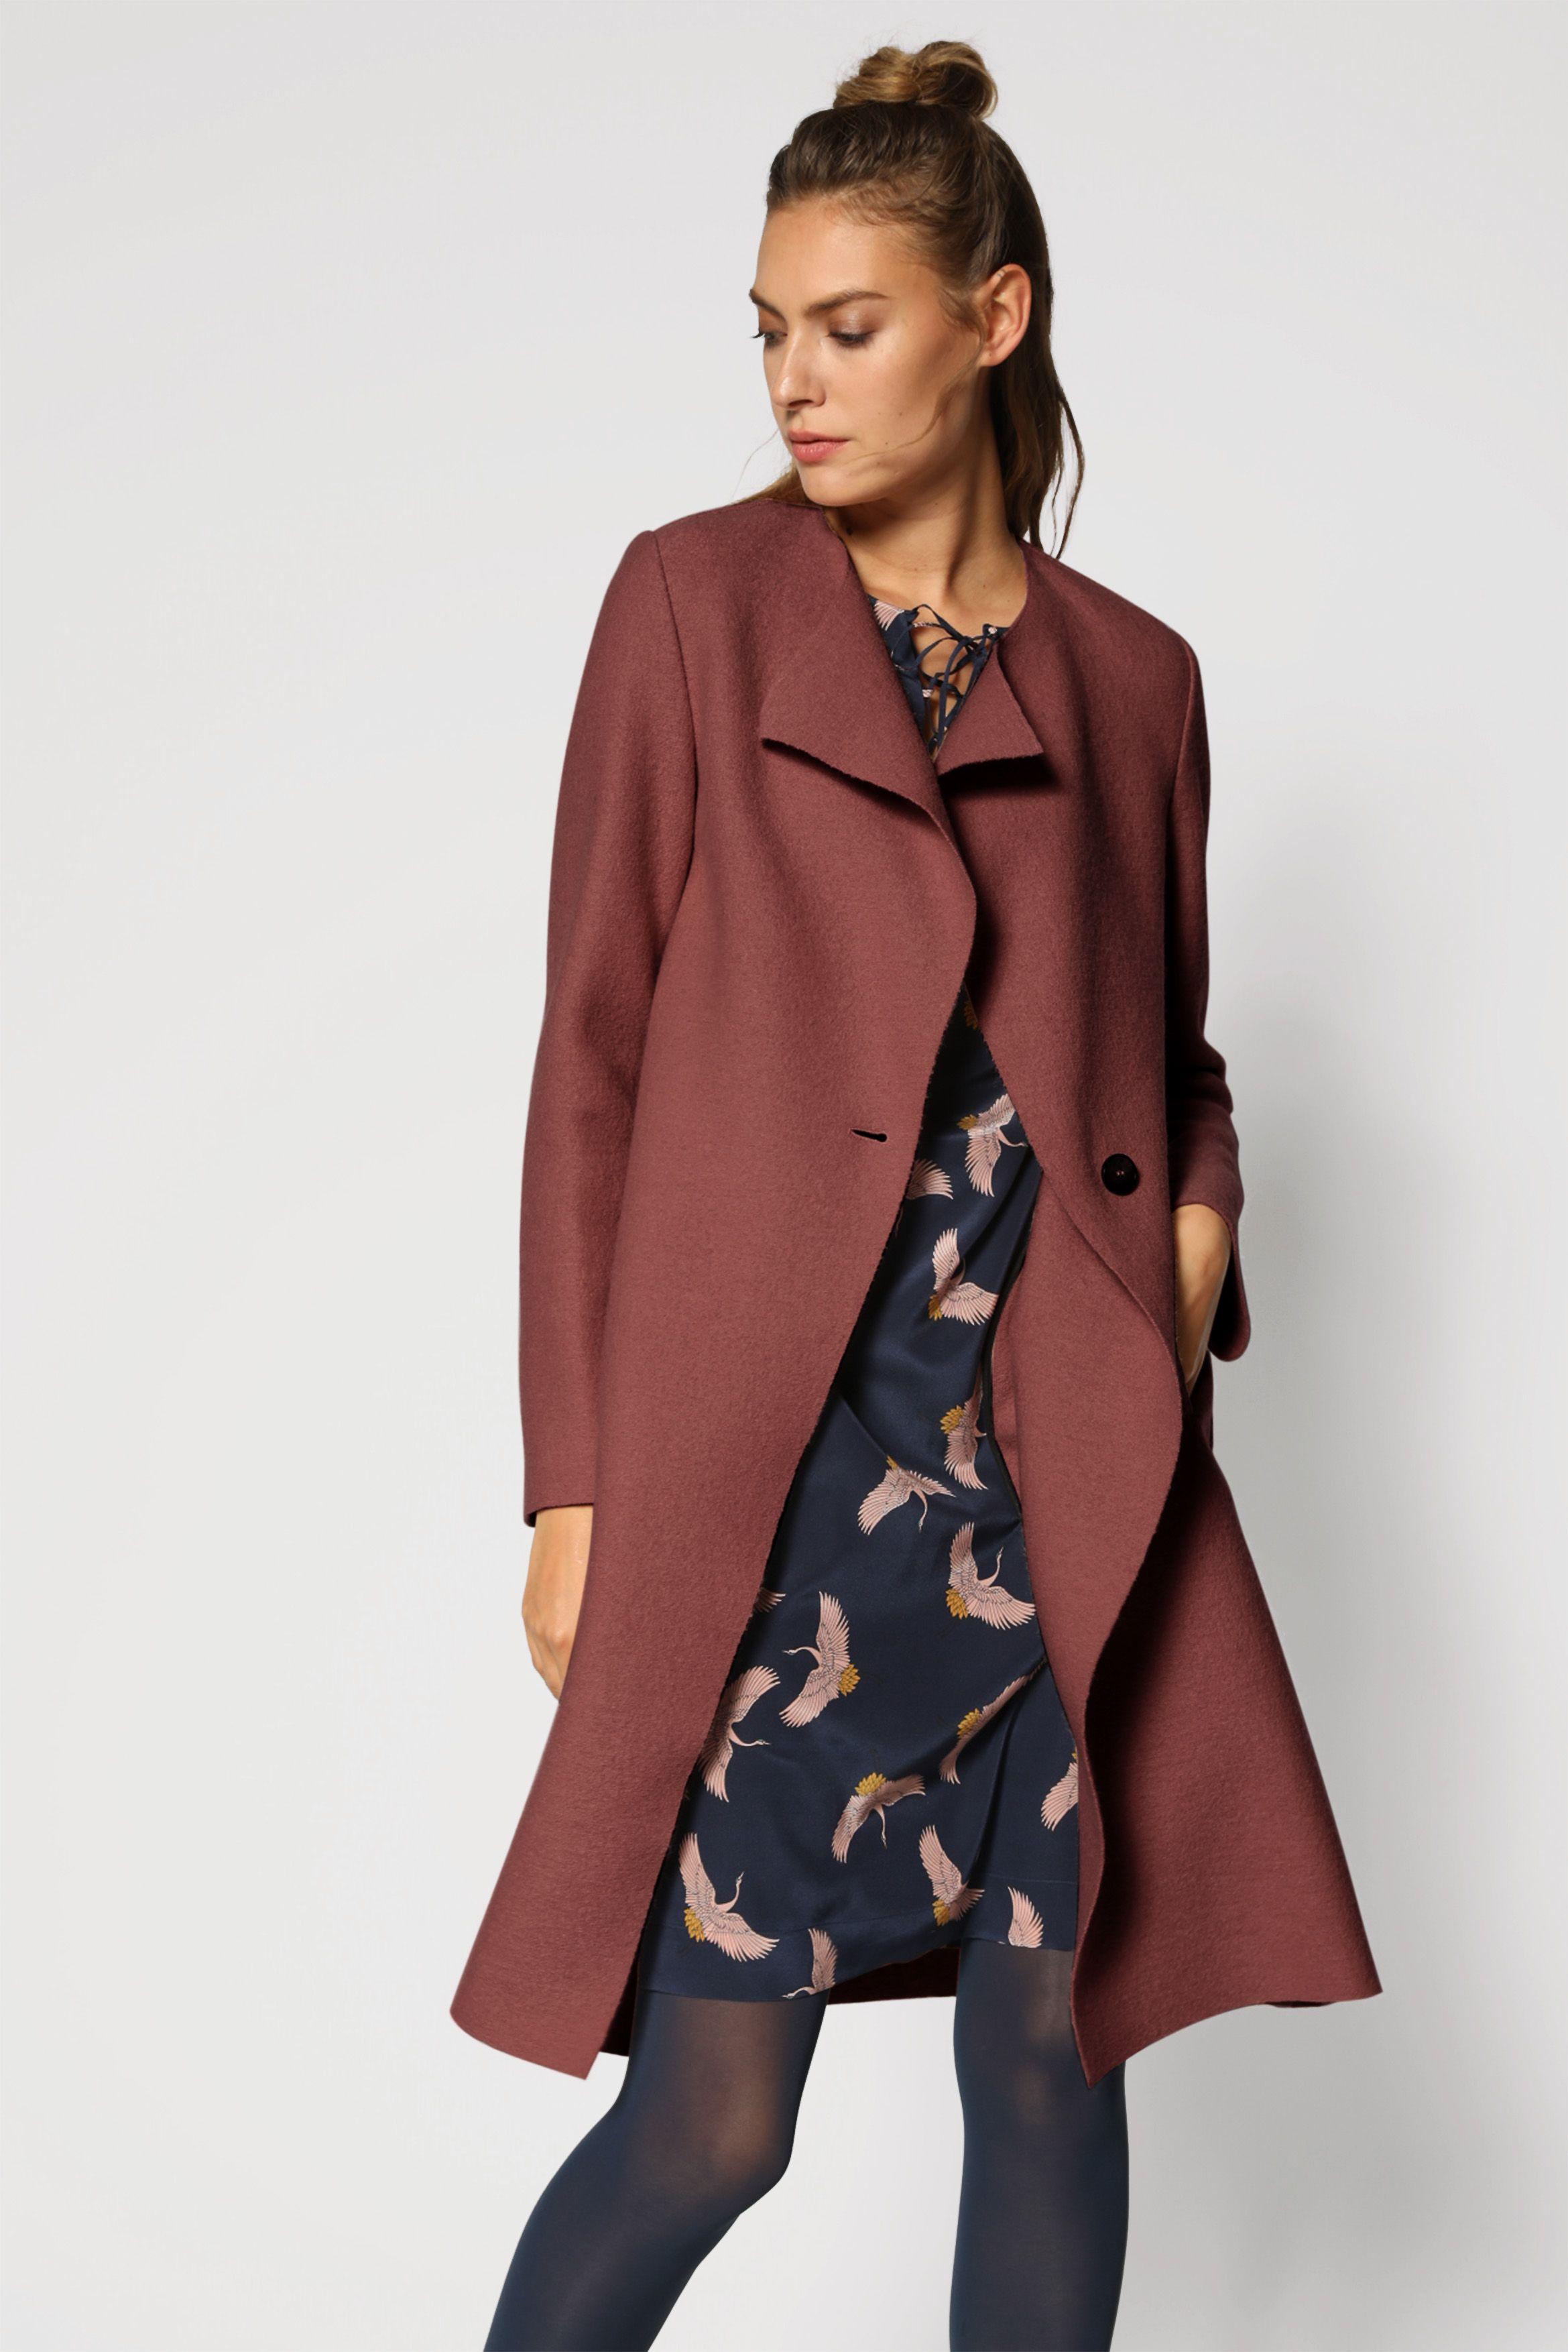 Nachhaltige Klamotten